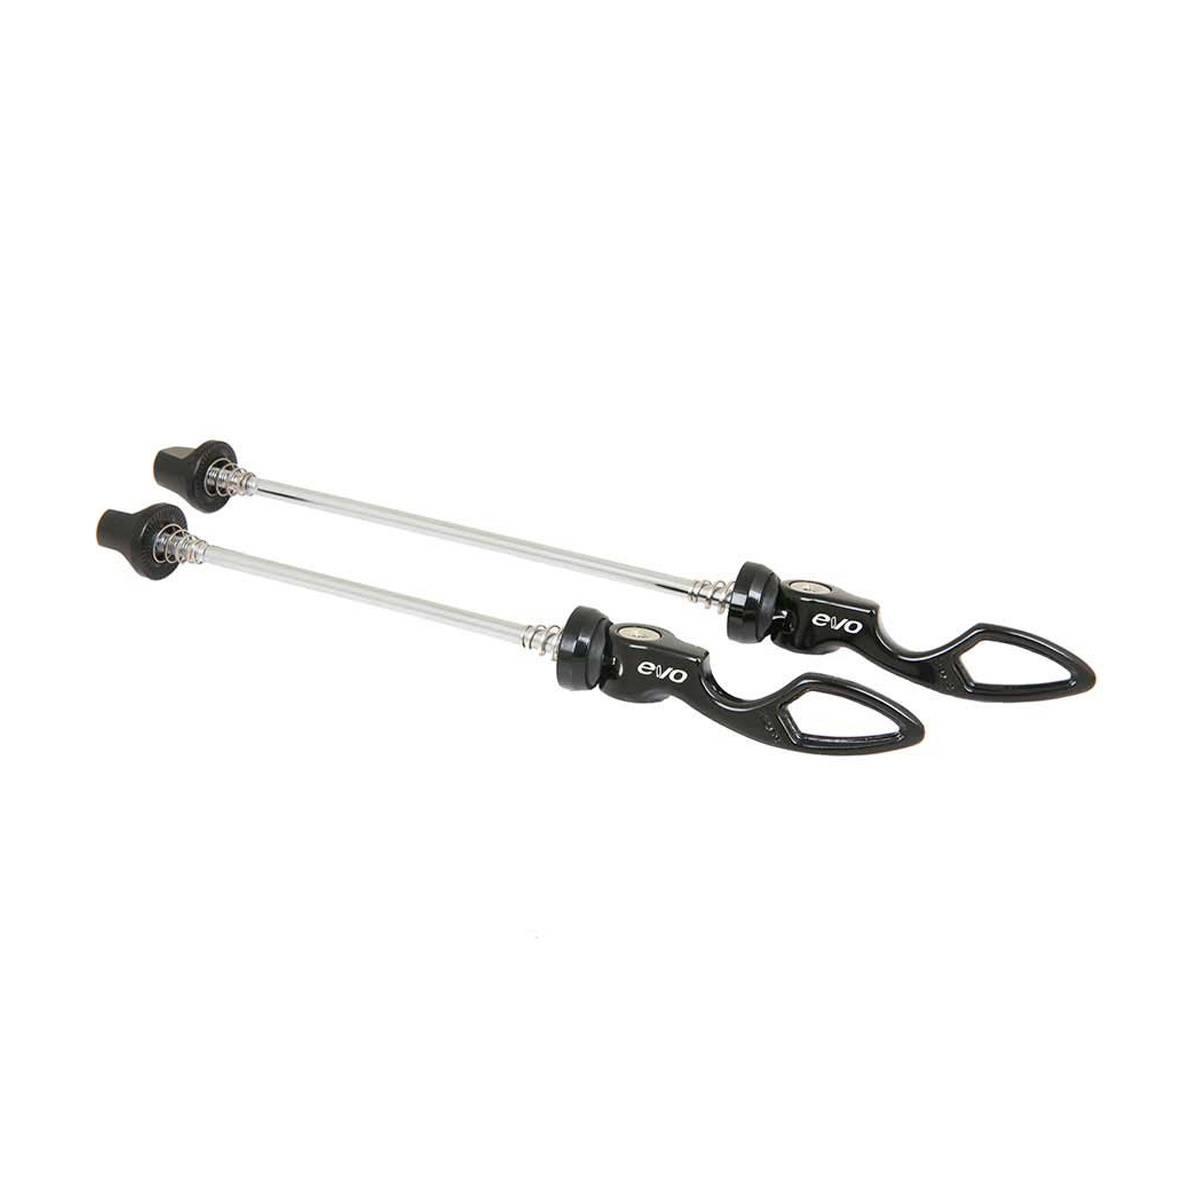 Wheel Shop,  24 EVO ETour 20 Argent/ Stainless  Roue, Arriere, 24, 36 rayons, JY434, Bolton, Pour rouelibre